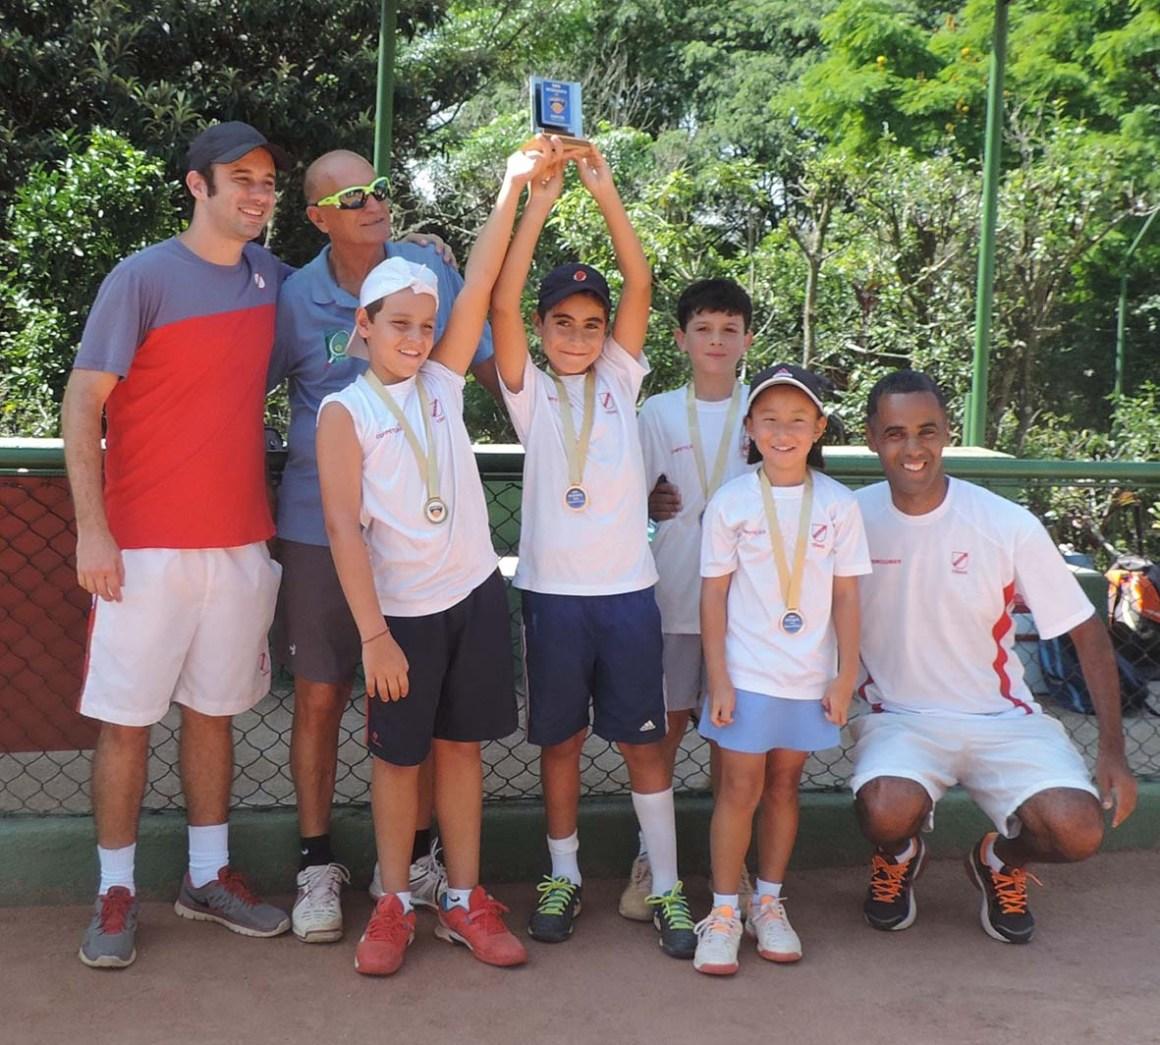 Copa Interequipes – Clube Atlético Indiano